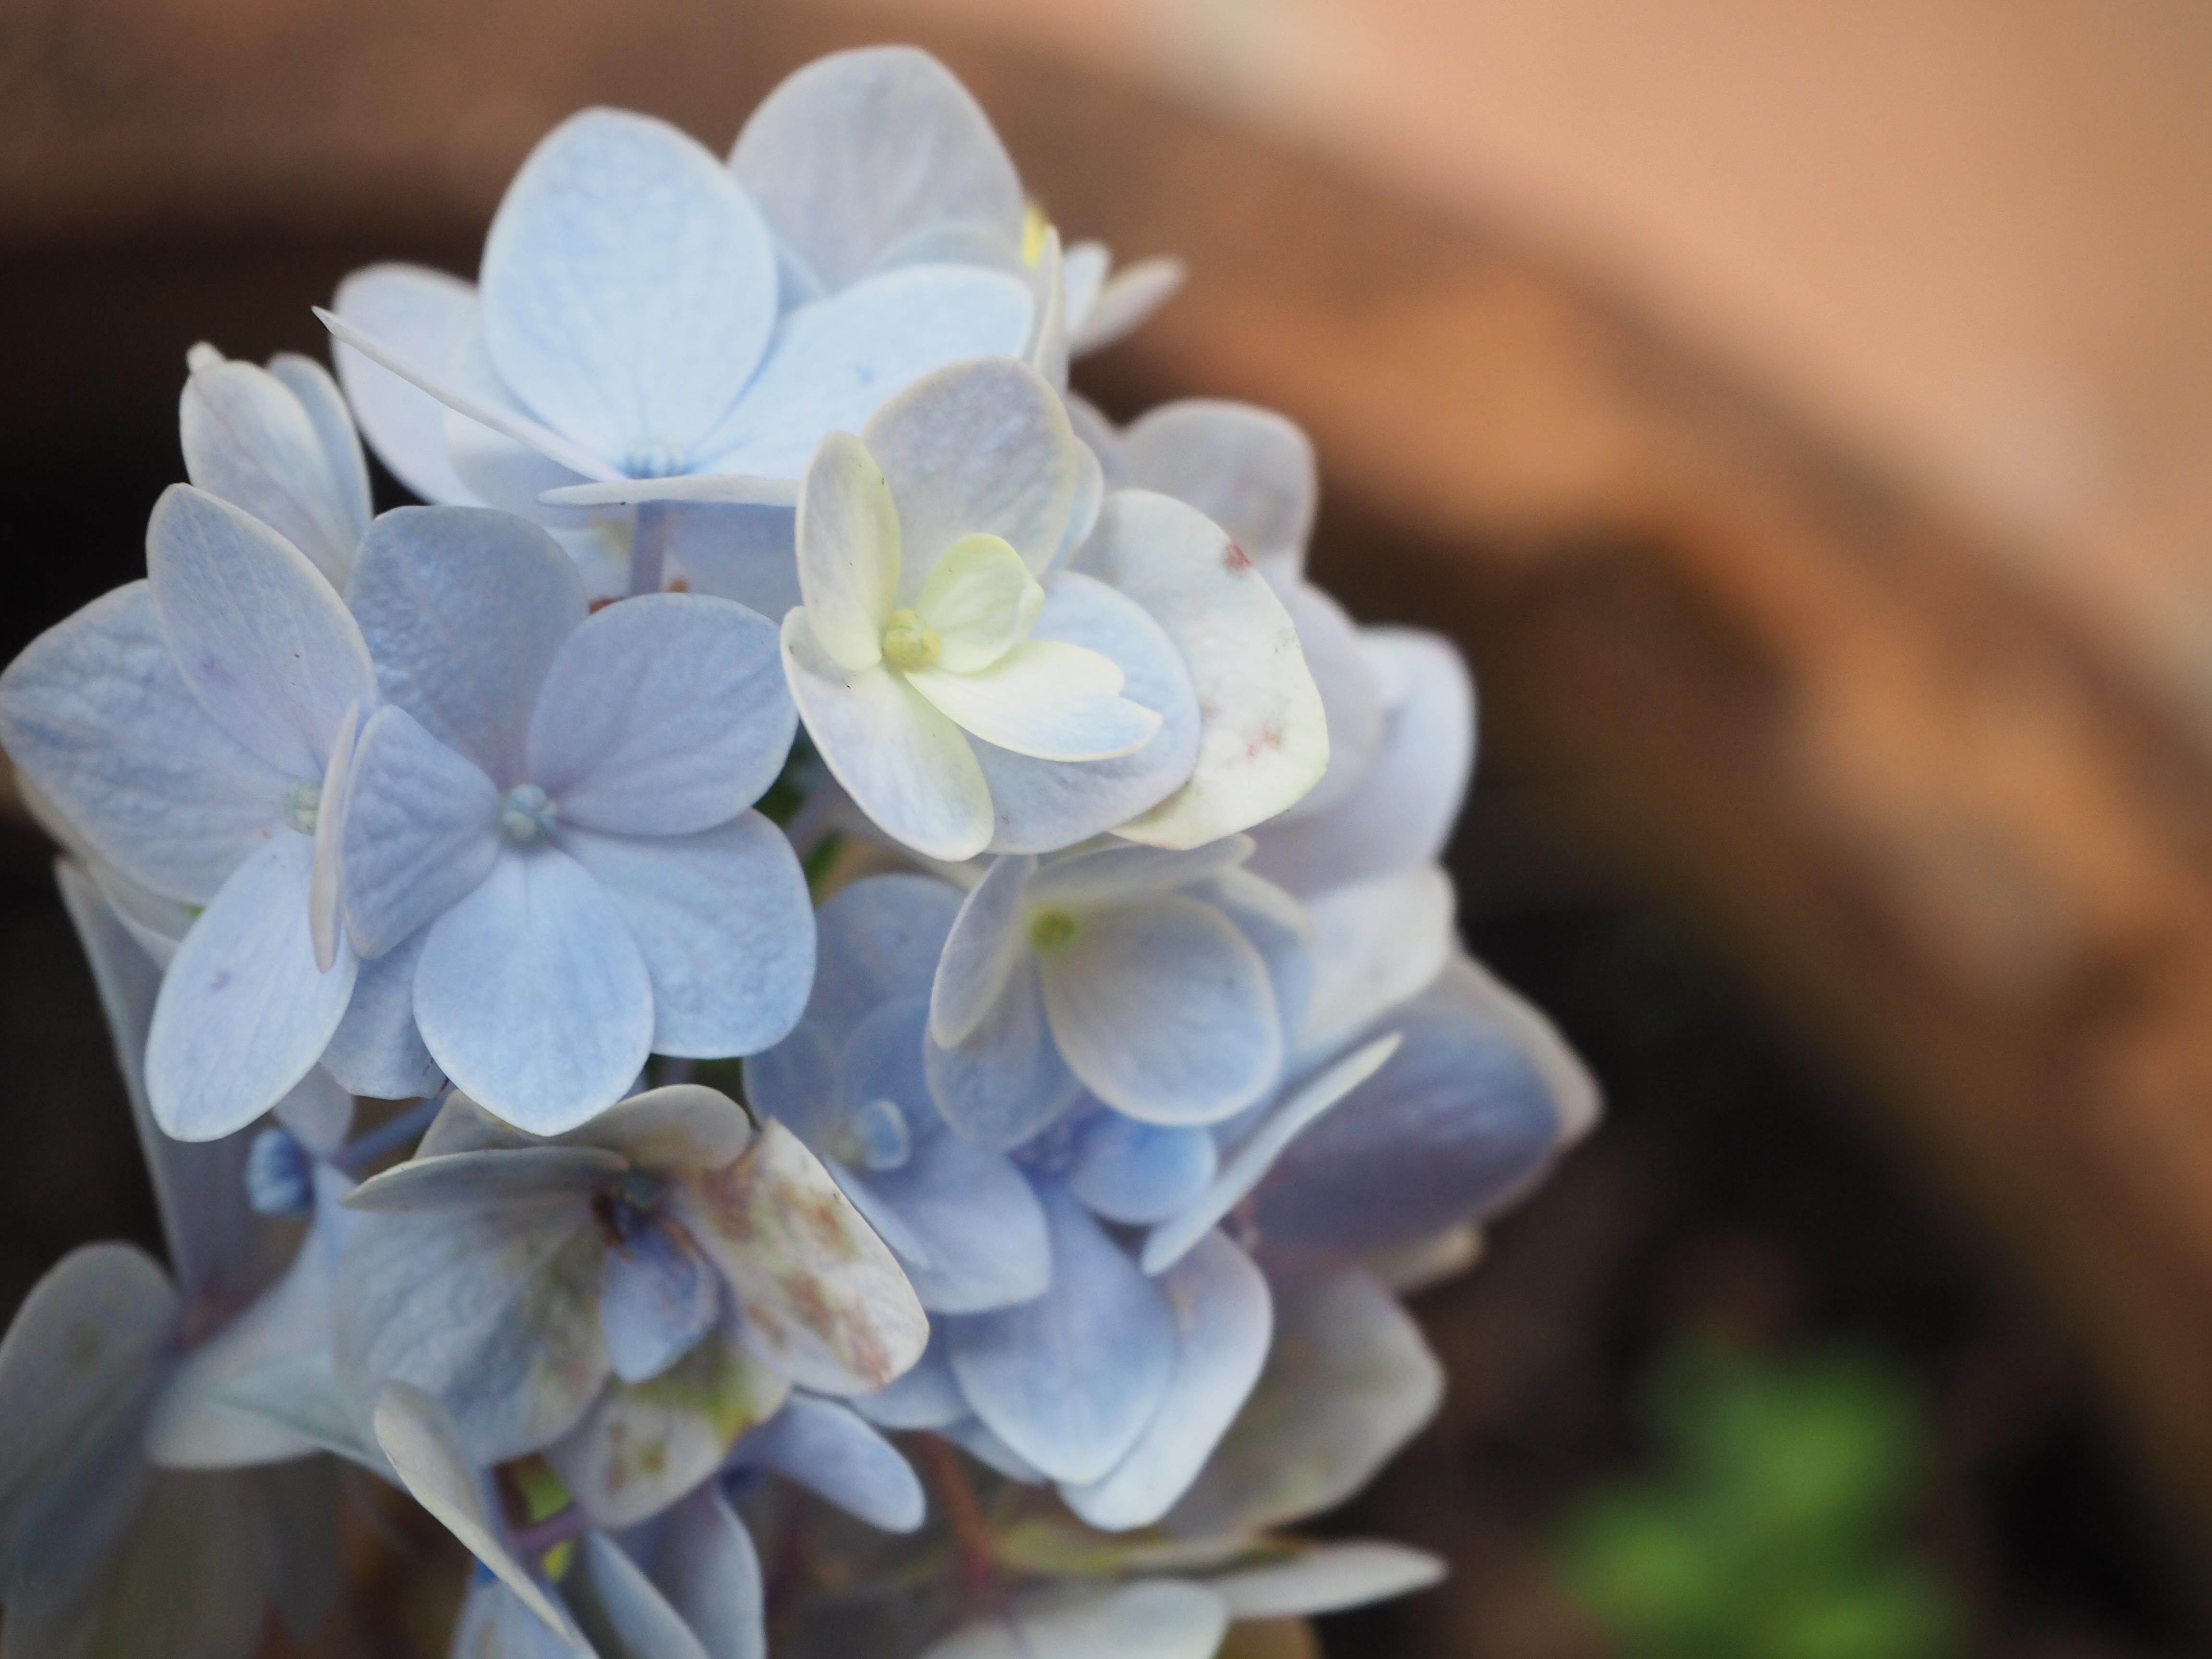 Free Images Blue Hydrangea Flower White Flowering Plant Flora